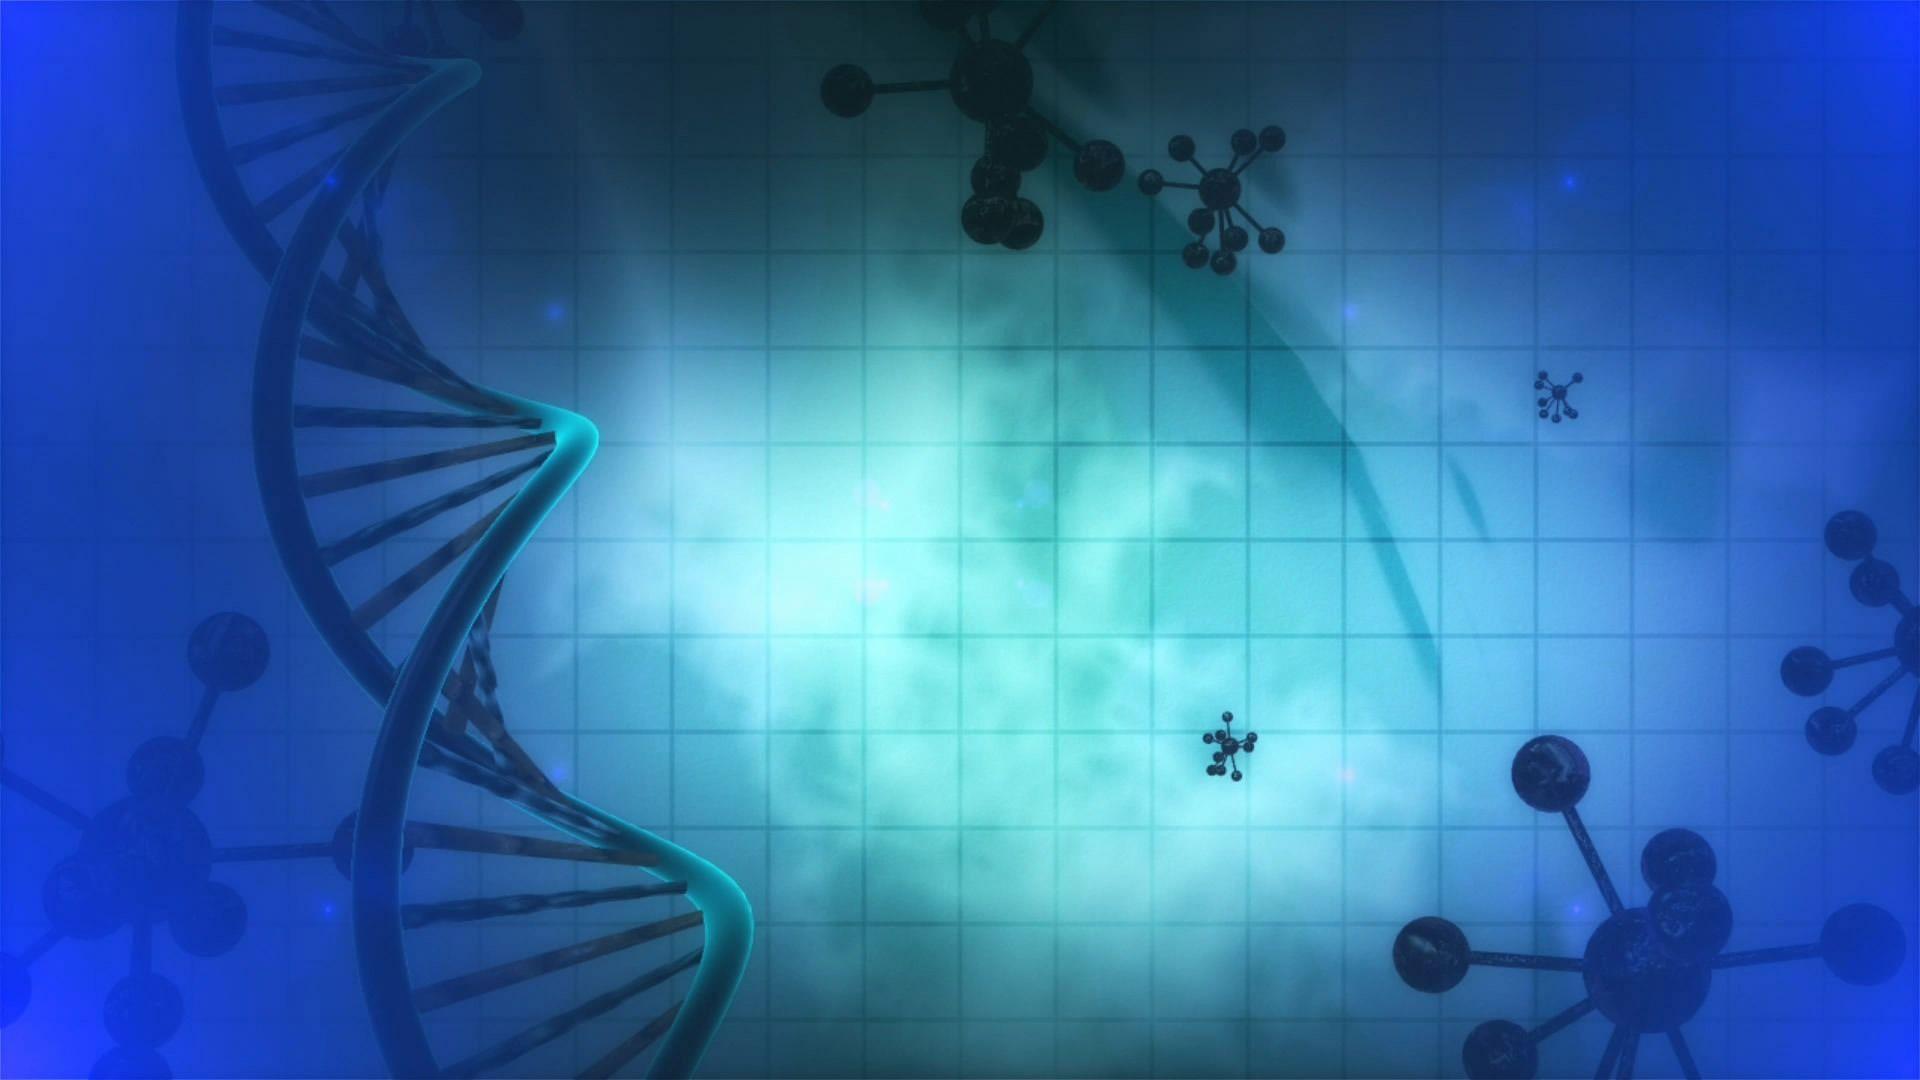 microbiology-163470.jpg